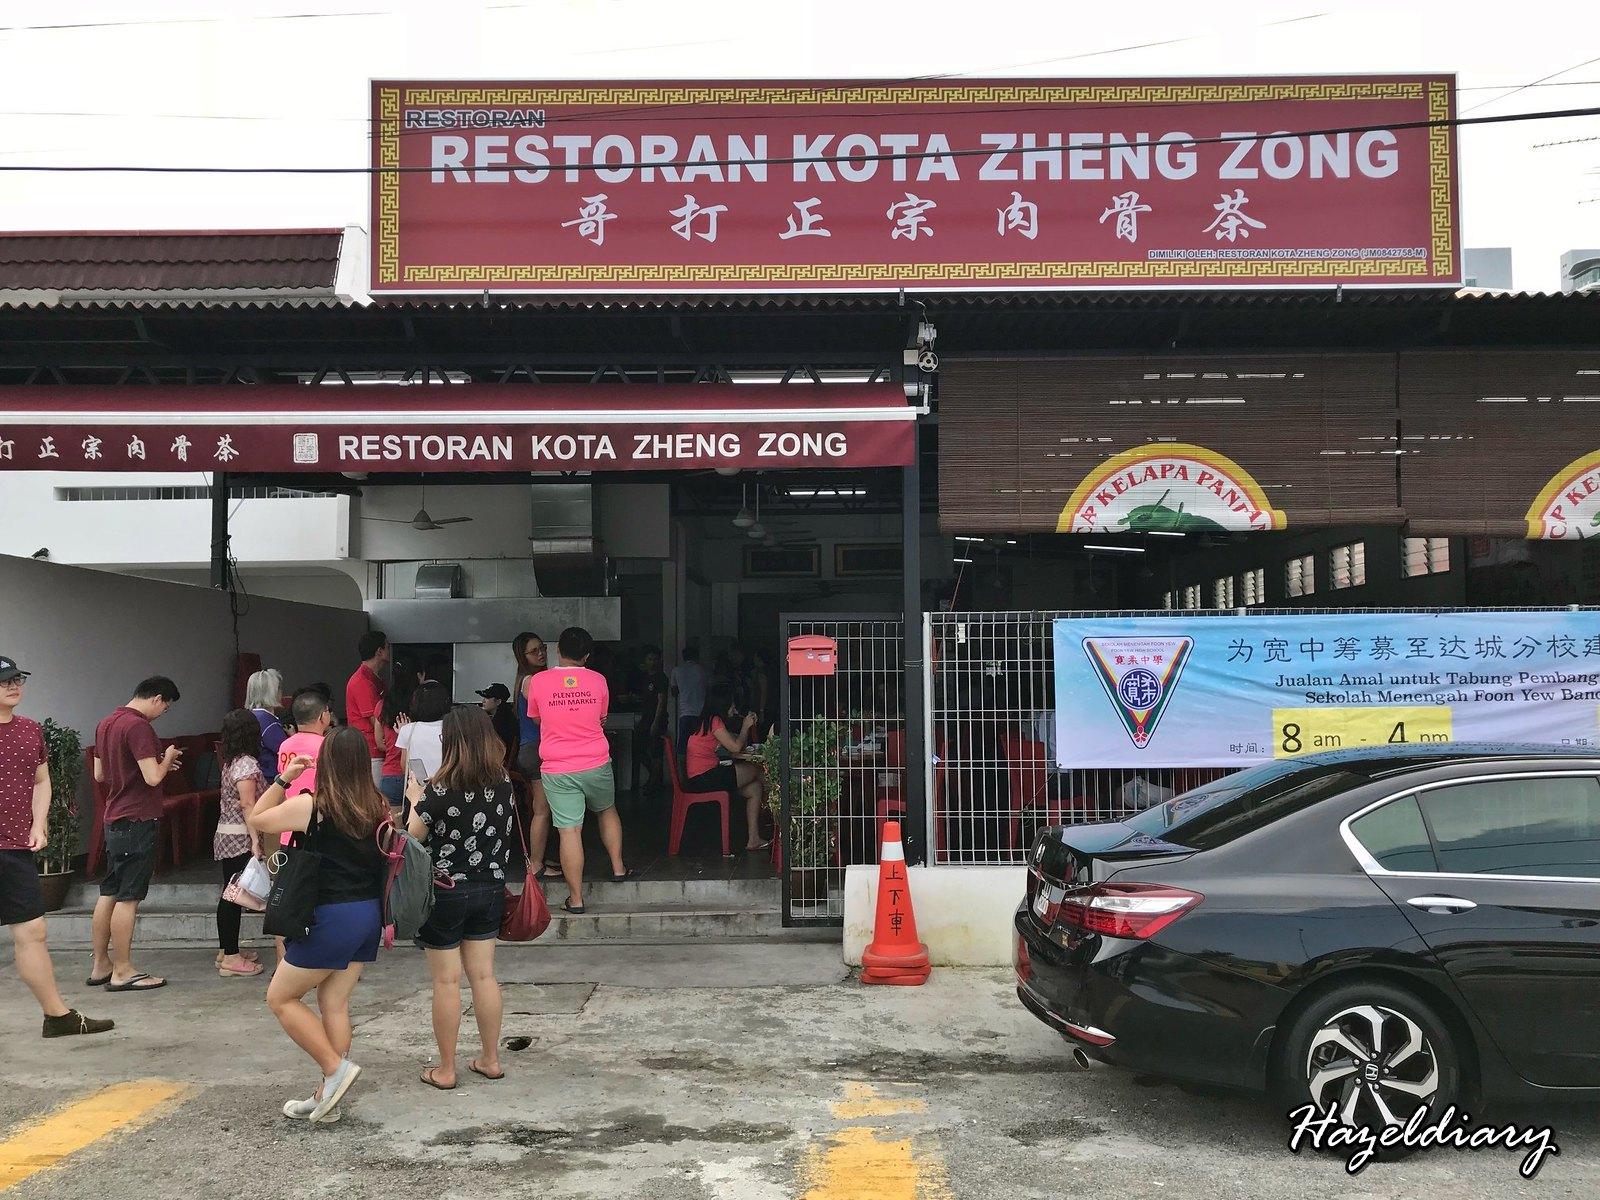 Restoran Kota Zheng Zhong-Bak Kut Teh-Taman Sentosa